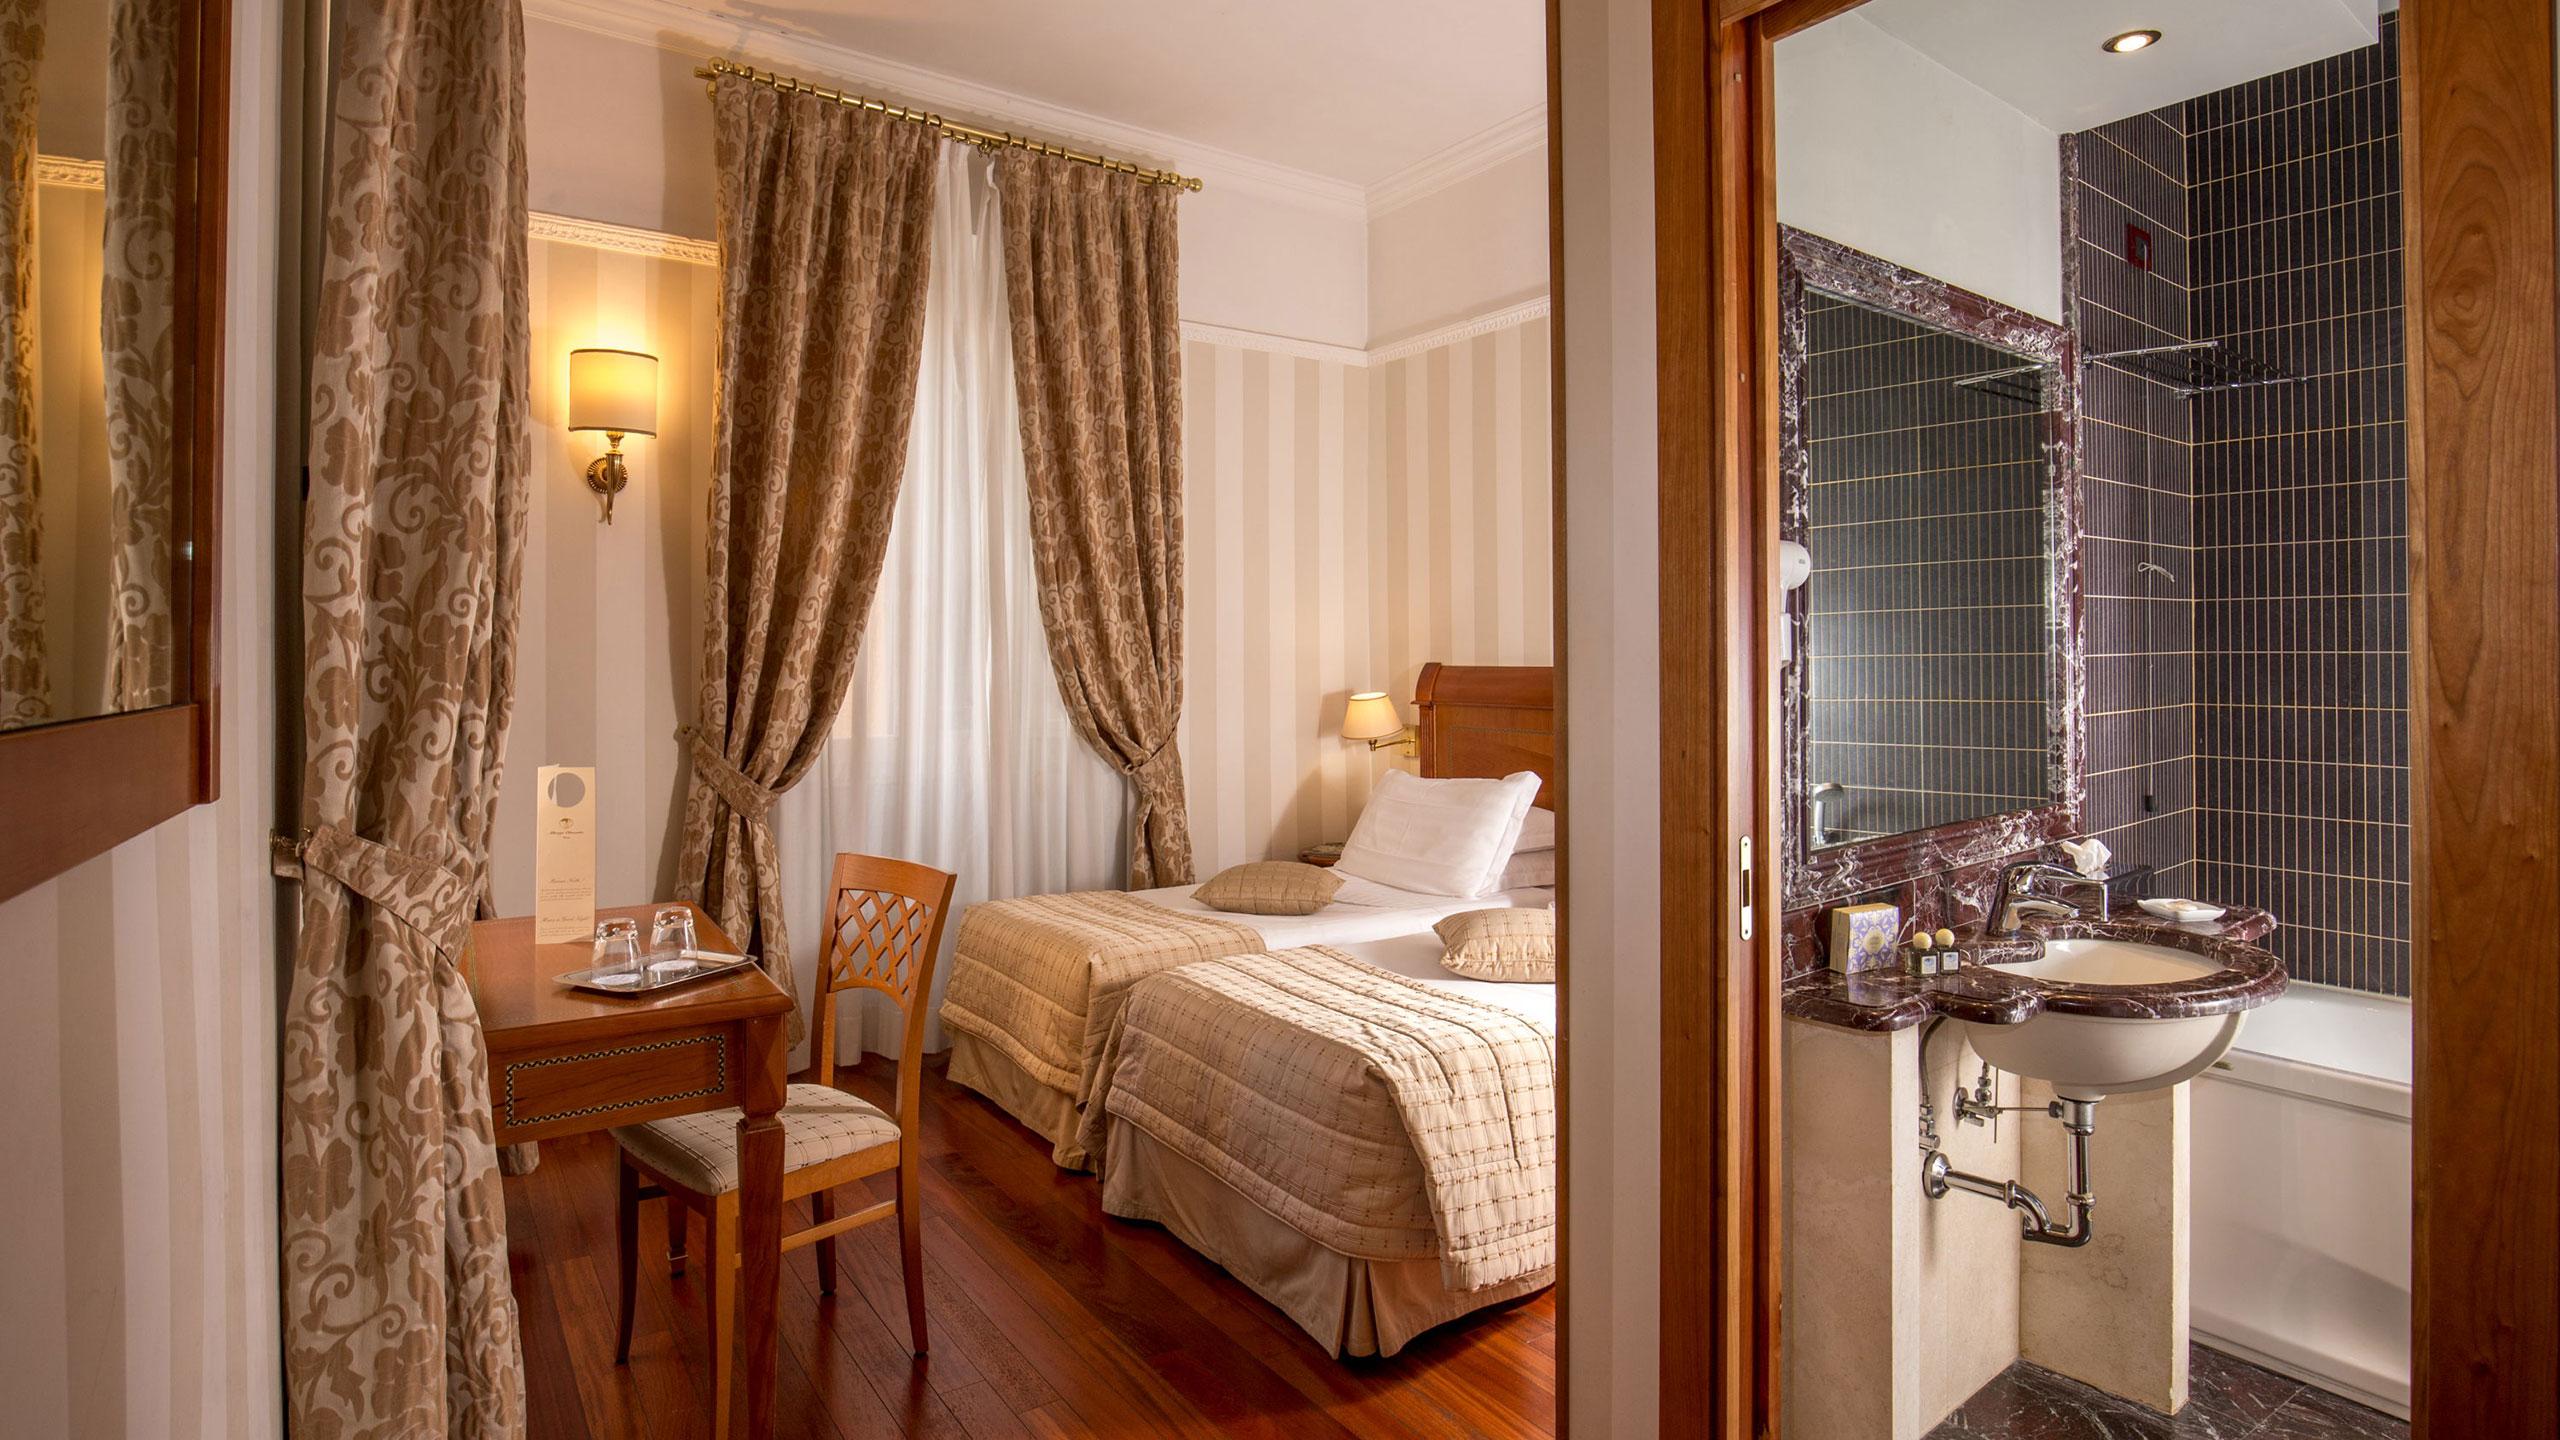 albergo-ottocento-rome-double-room-deluxe-09